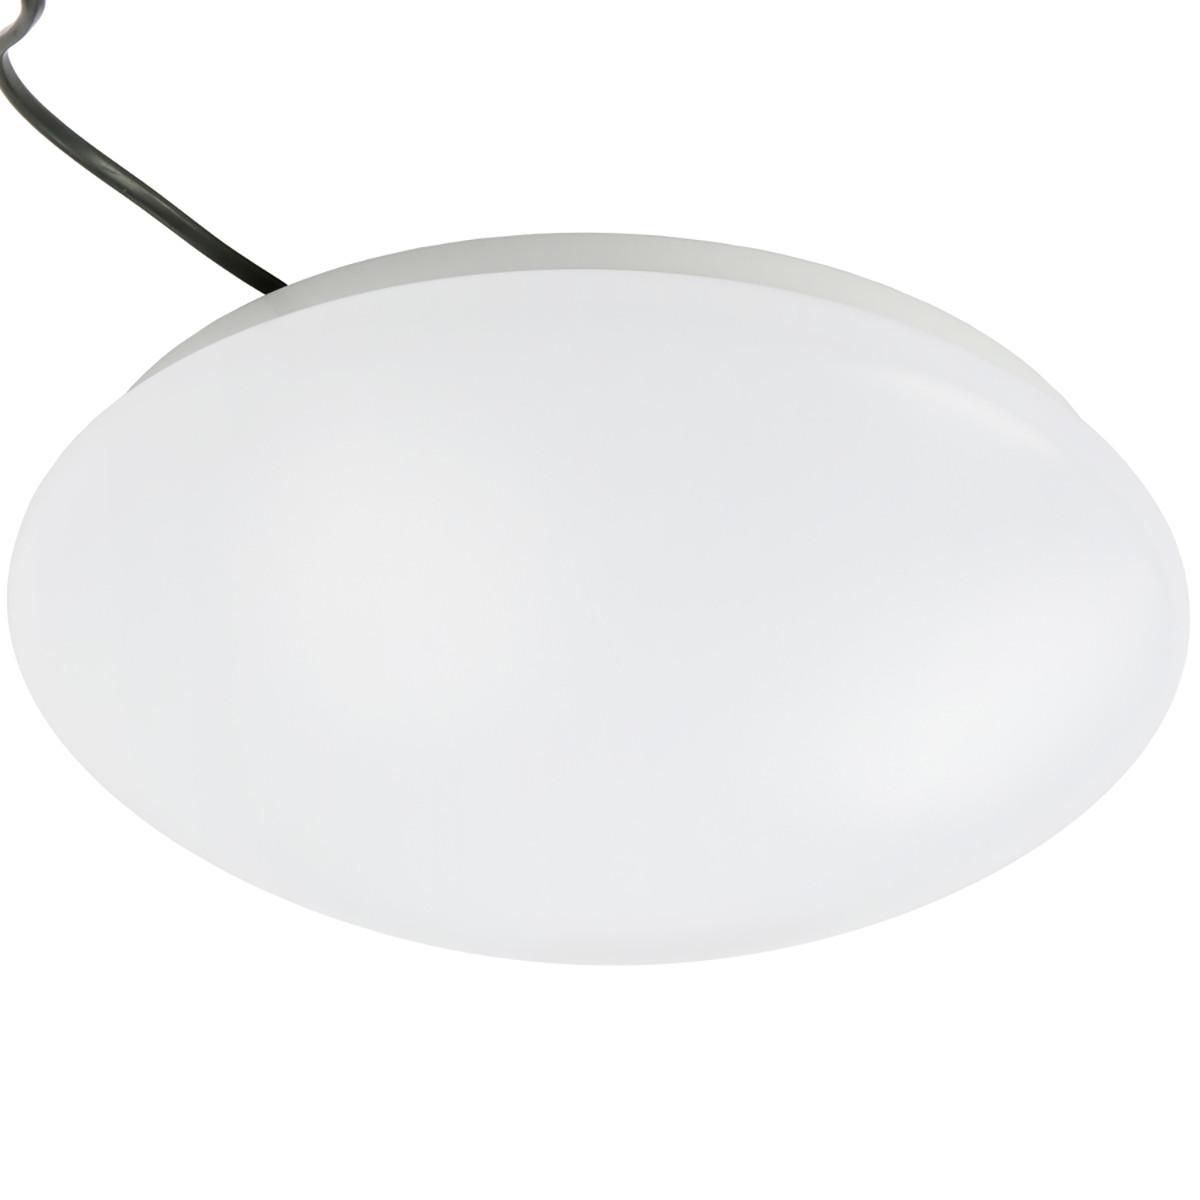 18W 13inch Modern LED Flush Mount Ceiling Light Fixture for Any Room  Round Acrylic Shade White Finish Mushroom Shape